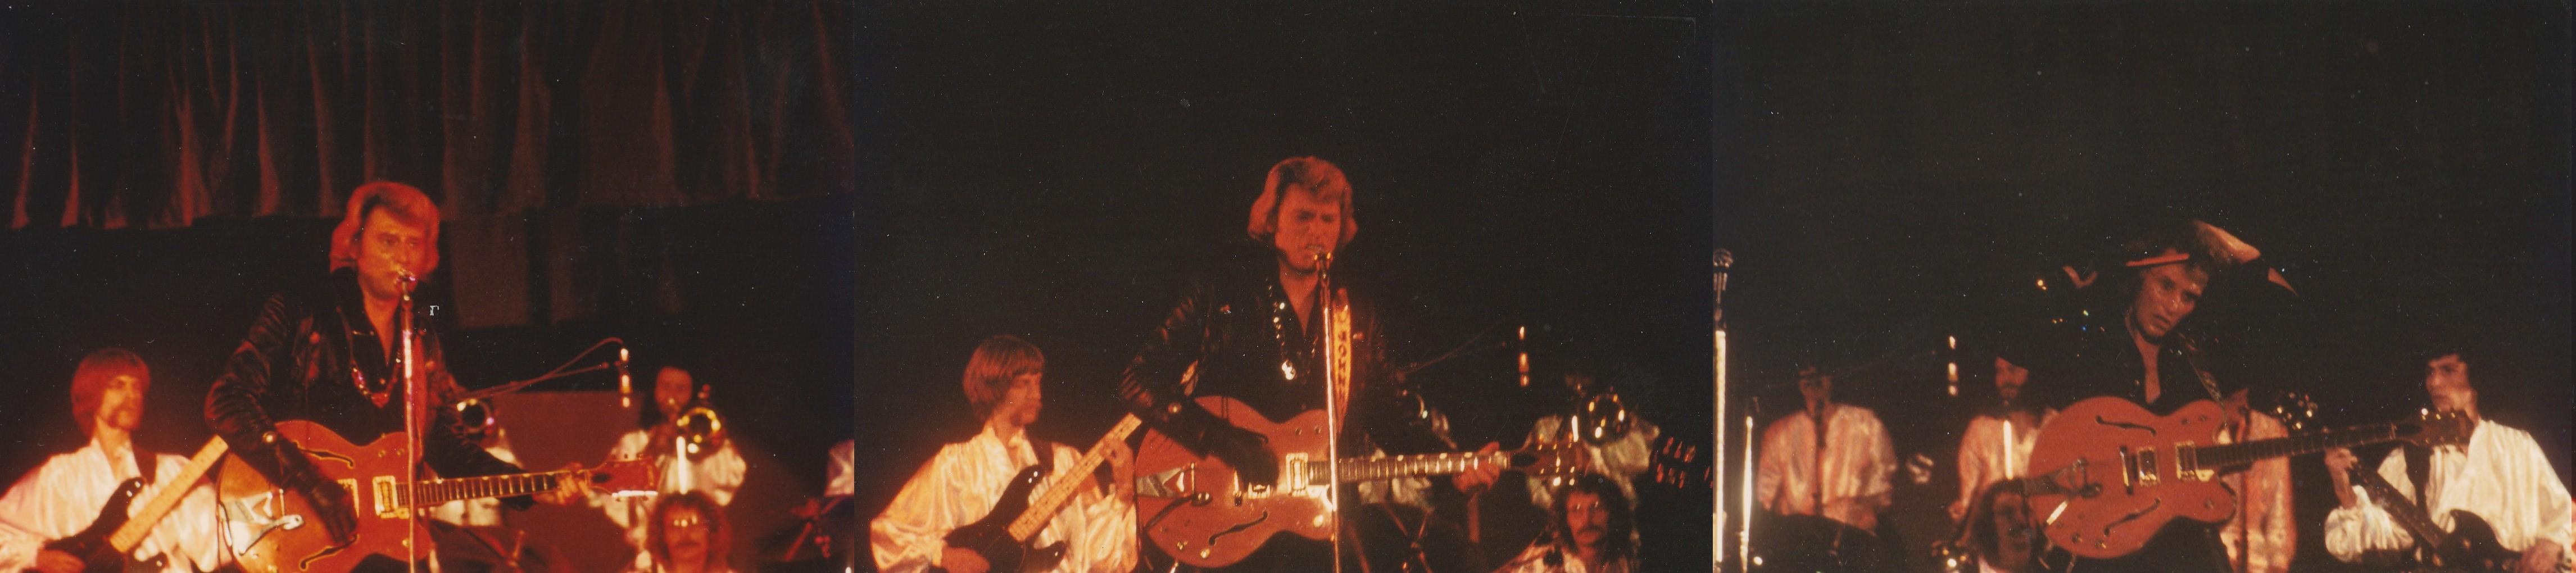 INÉDIT  :  JOHNNY HALLYDAY EN TOURNEE - HIVER 1978 -1979 ( PHOTOS INÉDITES )   0163